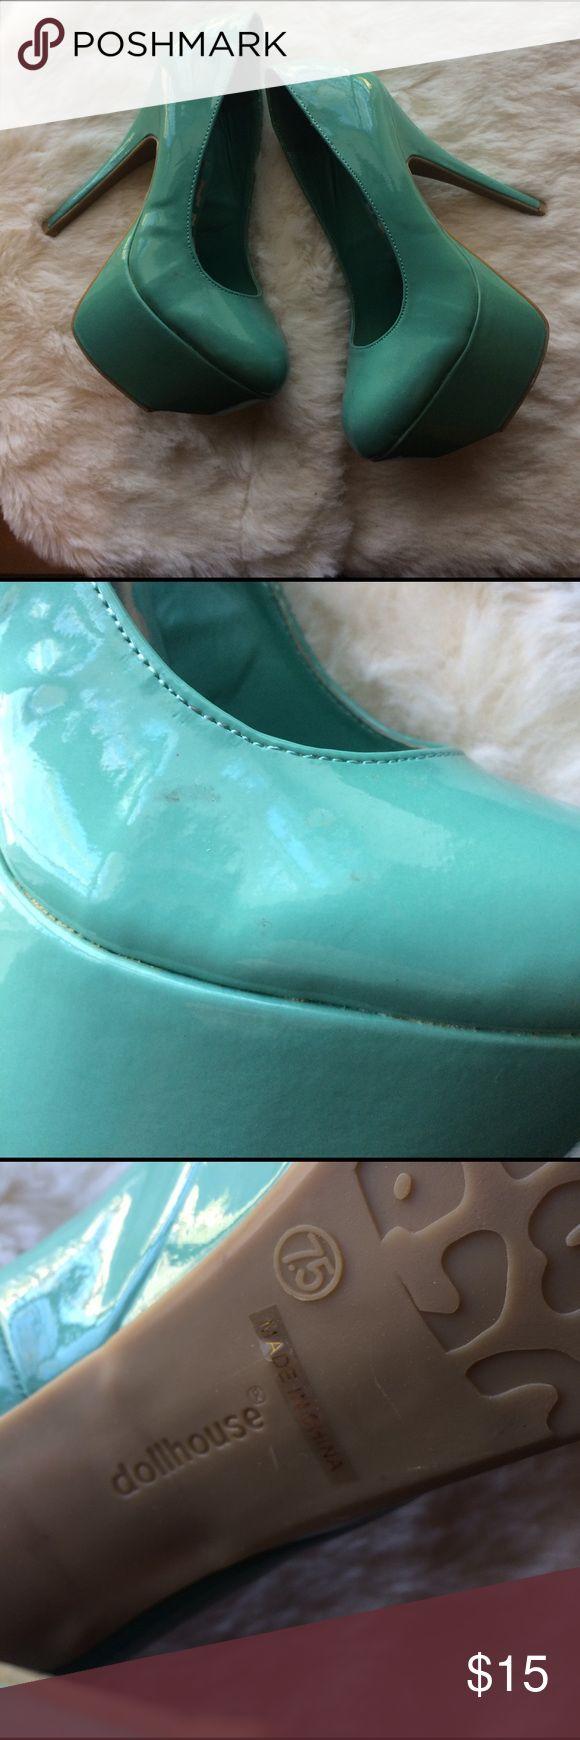 Dollhouse aqua heels Like new worn twice dollhouse heels. Minor scuffs can barley notice. Dollhouse Shoes Heels